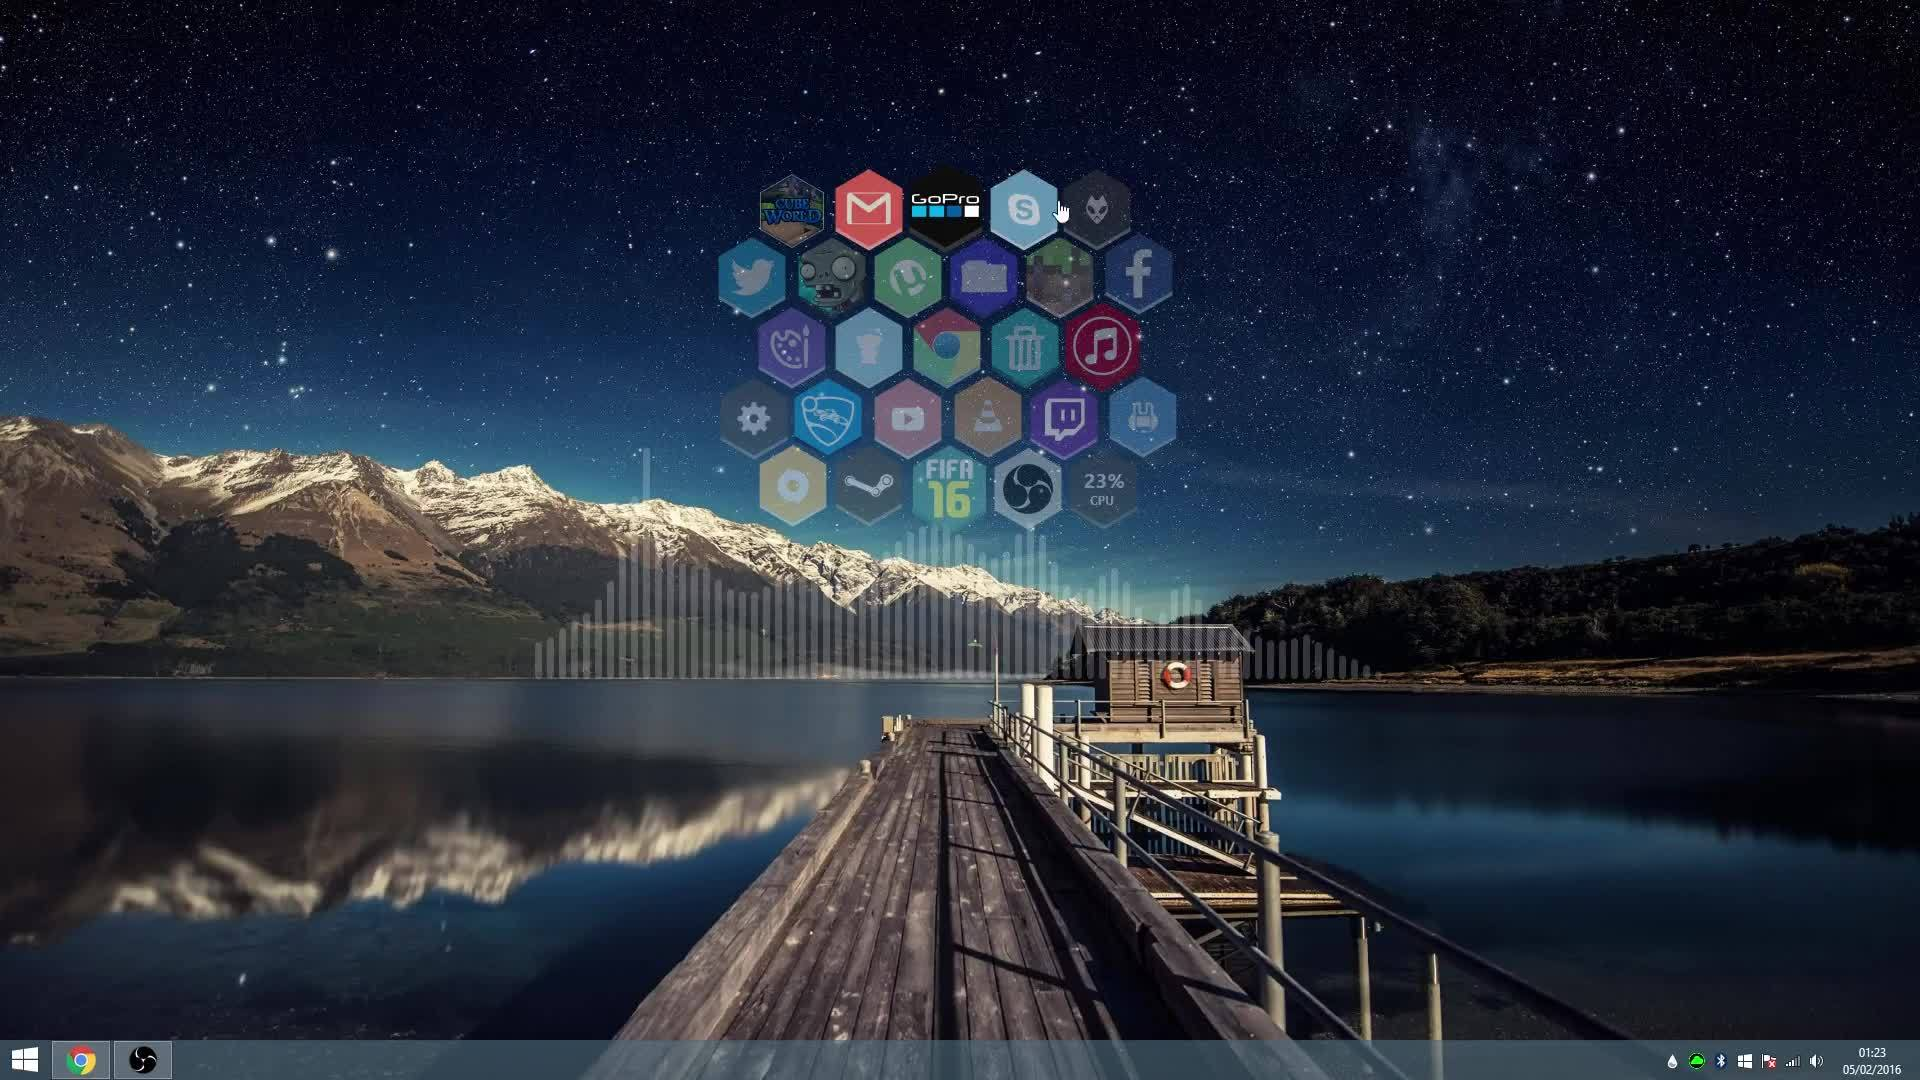 desktops, rainmeter desktop GIFs